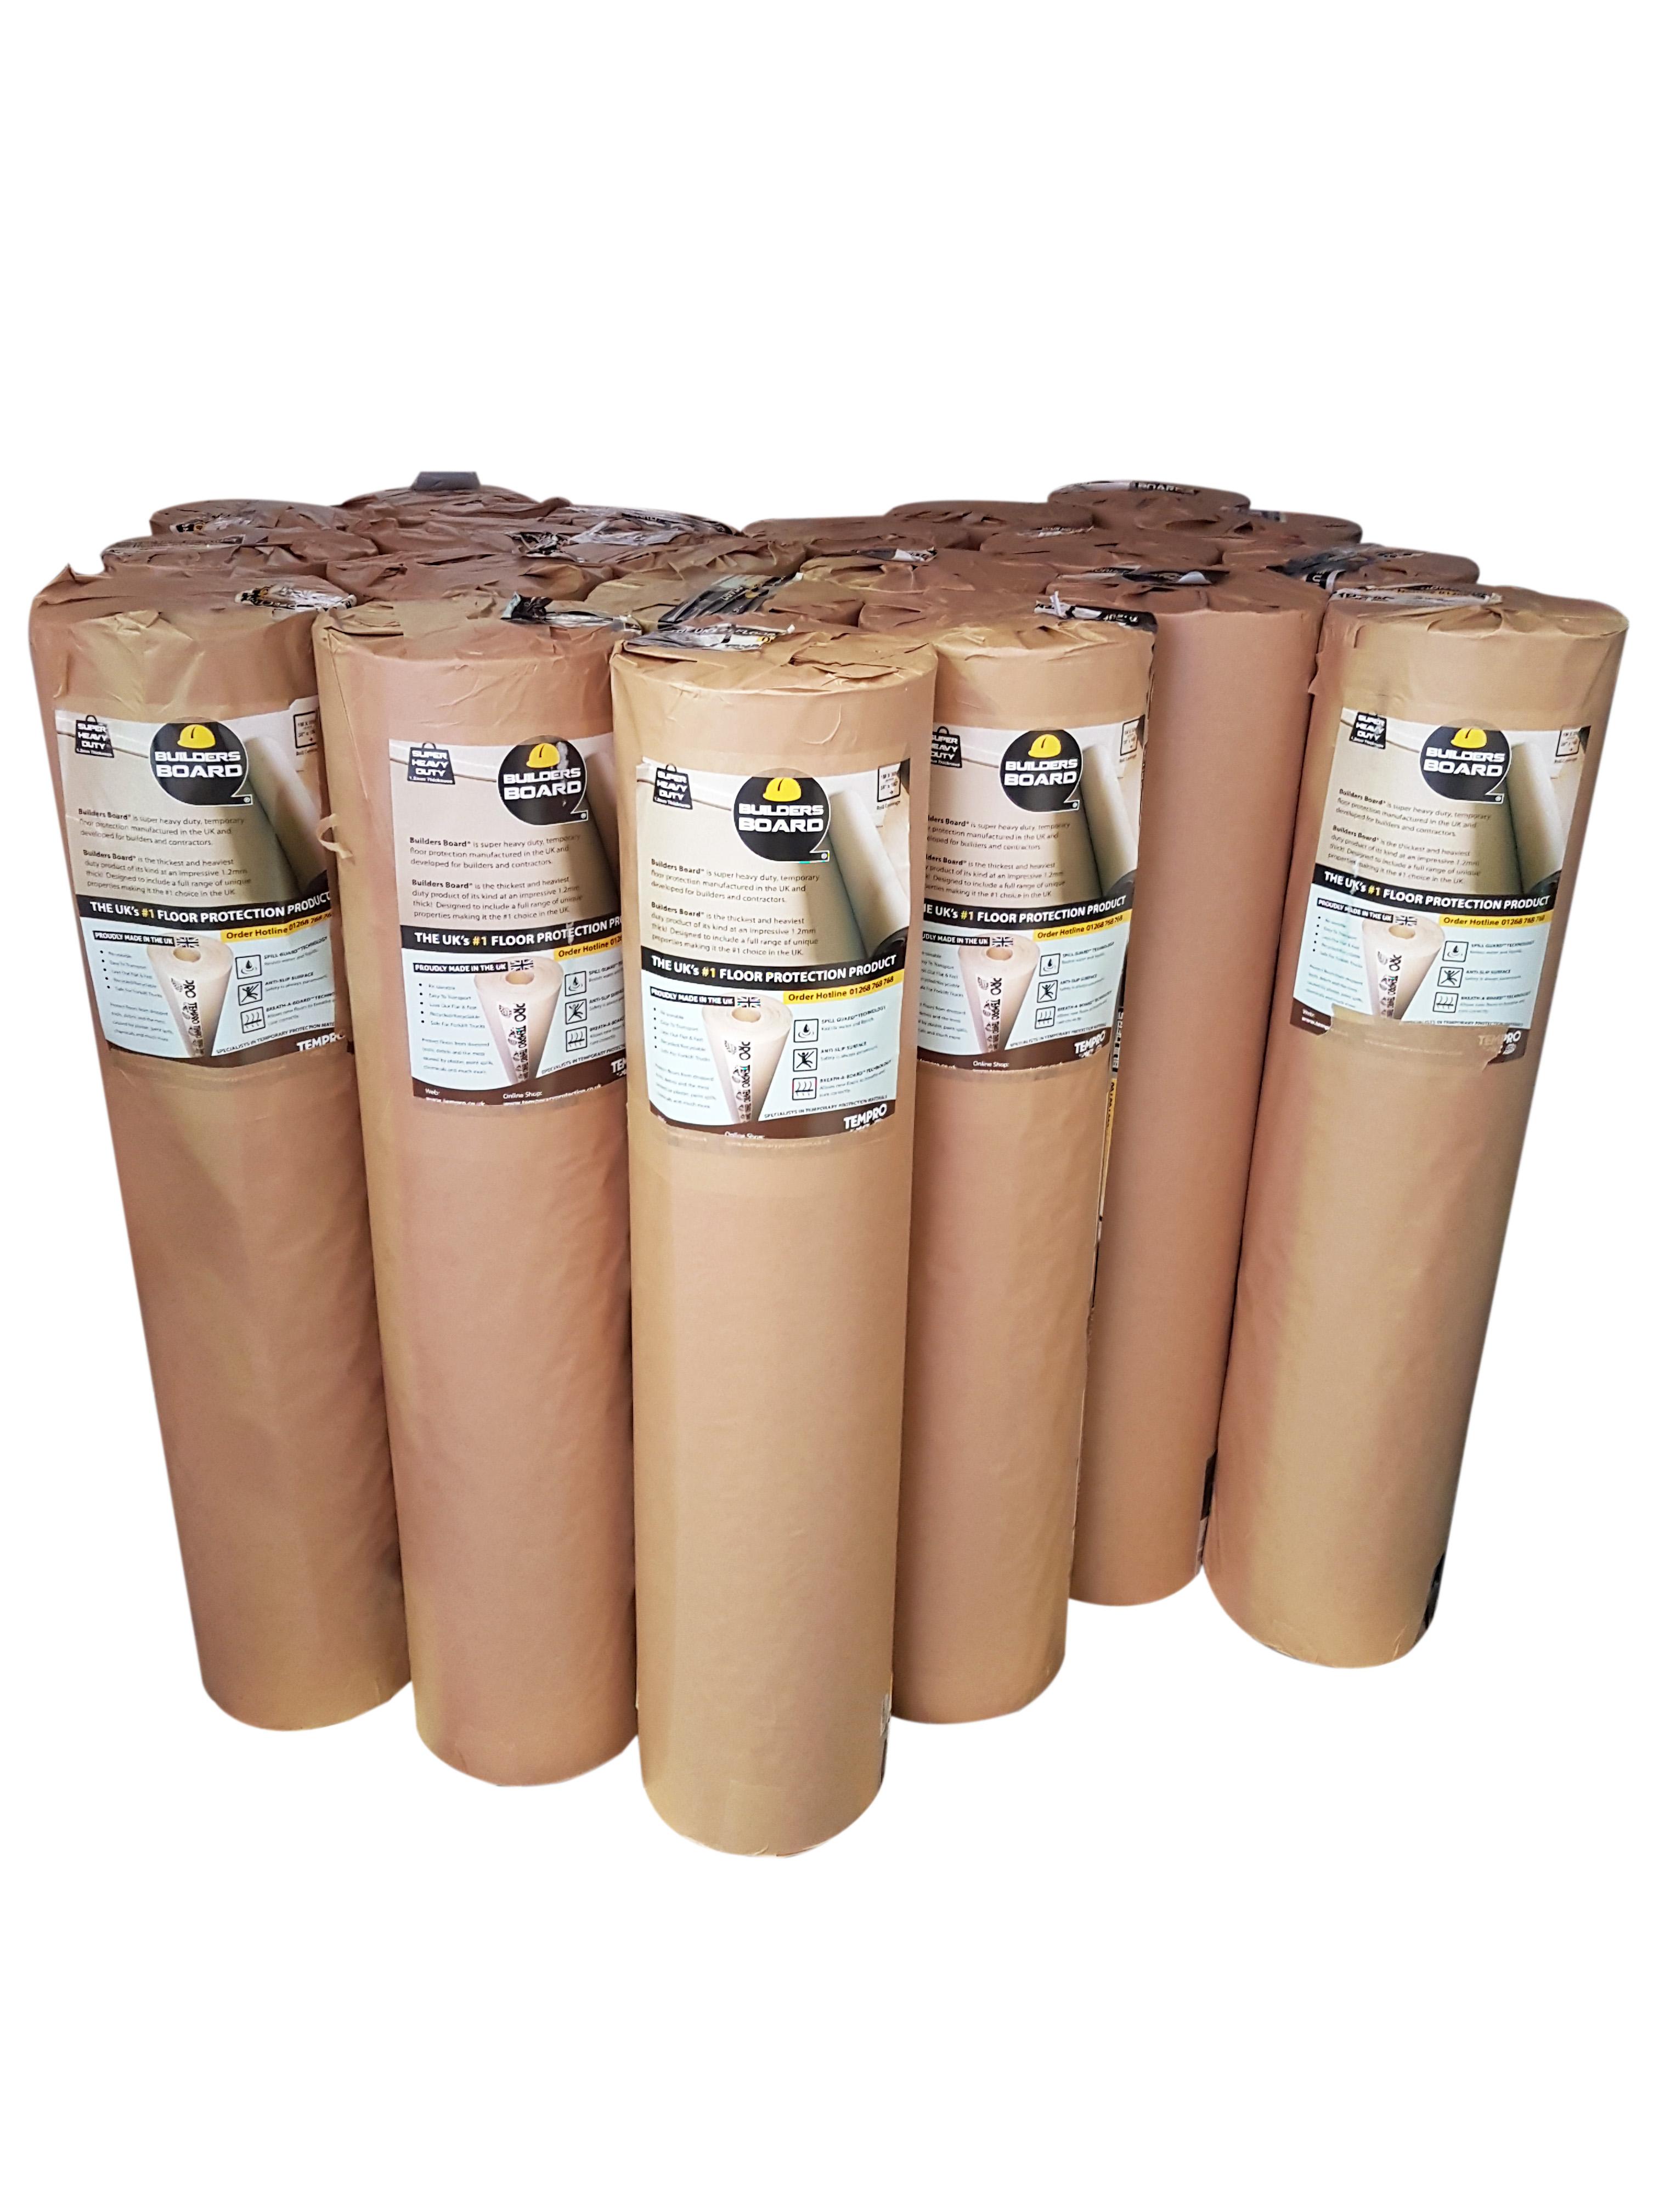 Builders Board® Super Heavy Duty Floor & Surface Protection